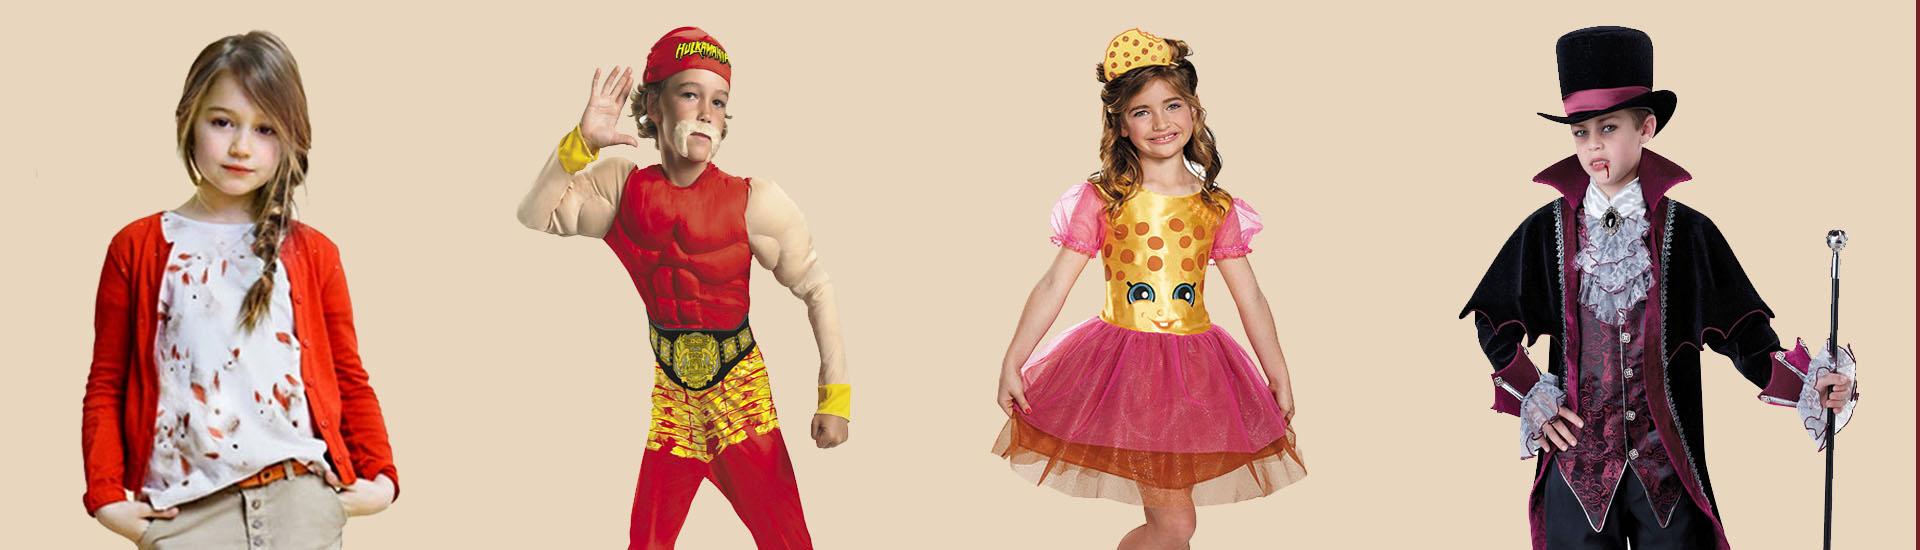 Kids-Costumes